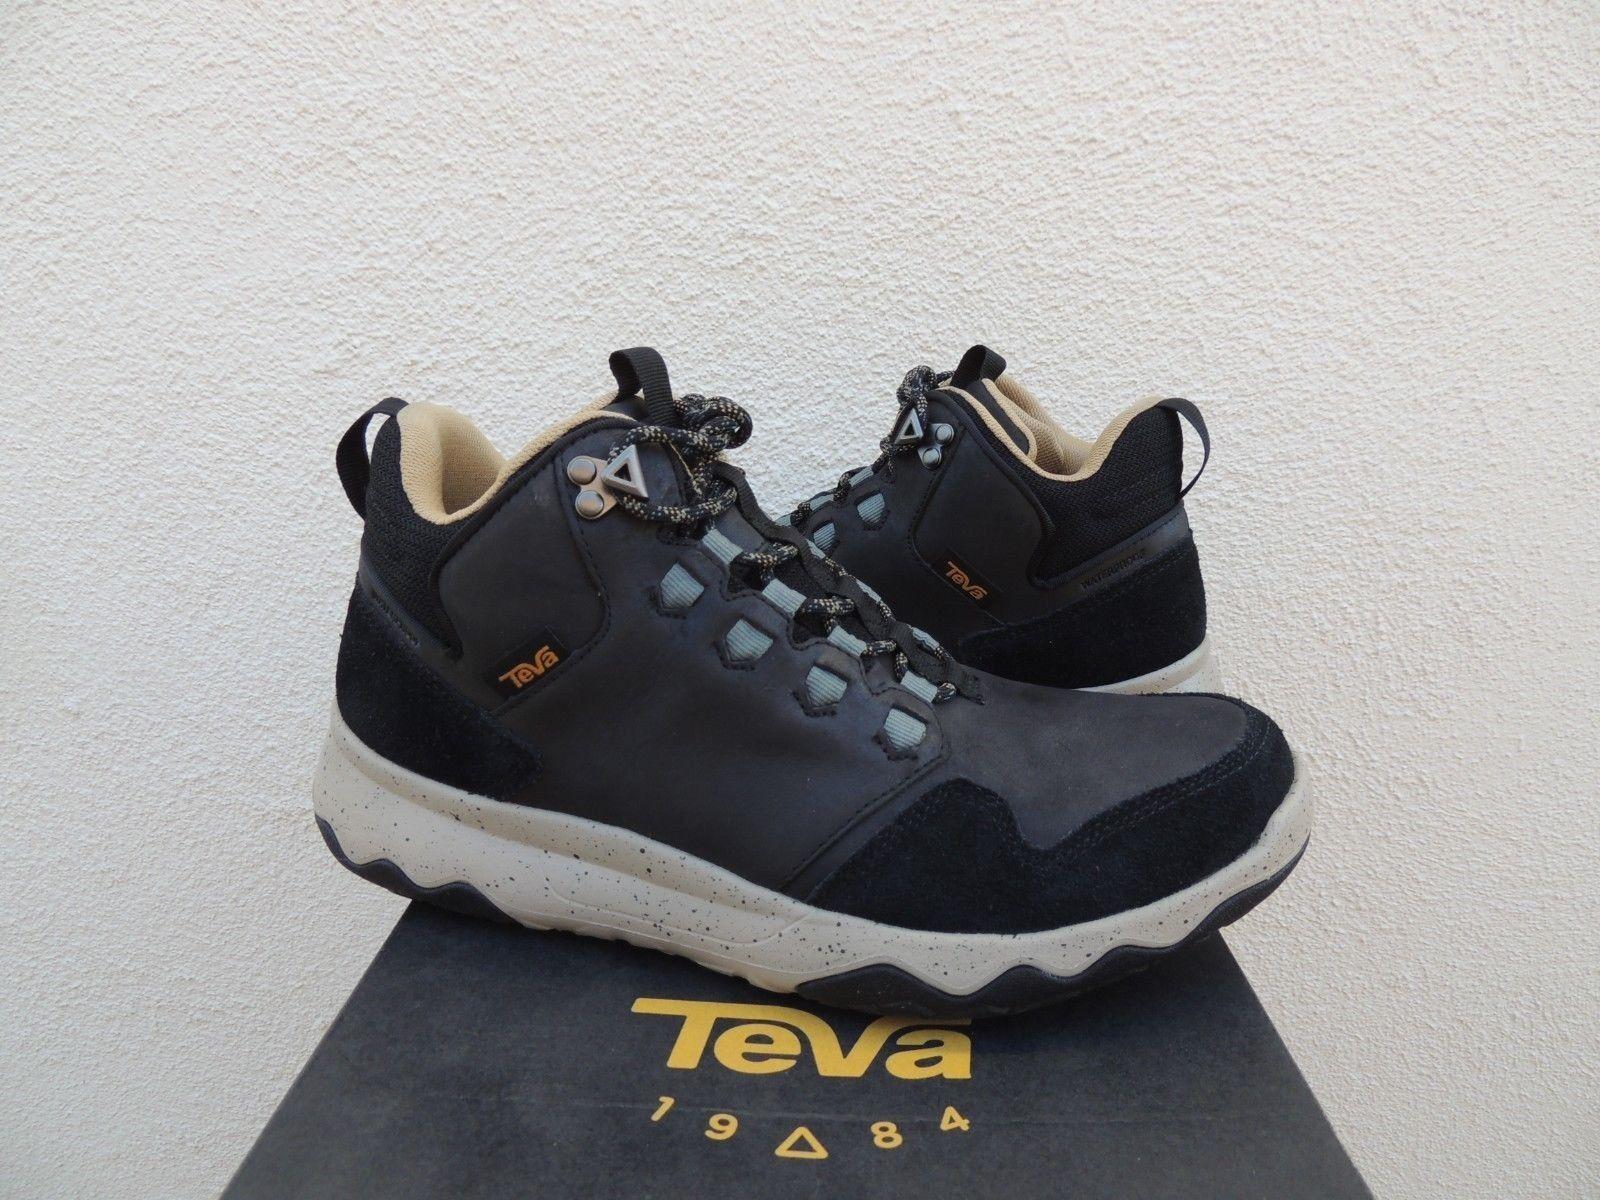 TEVA schwarz ARROWOOD LUX MID WP LEATHER Turnschuhe Stiefel, MEN US 10  EUR 43 NIB